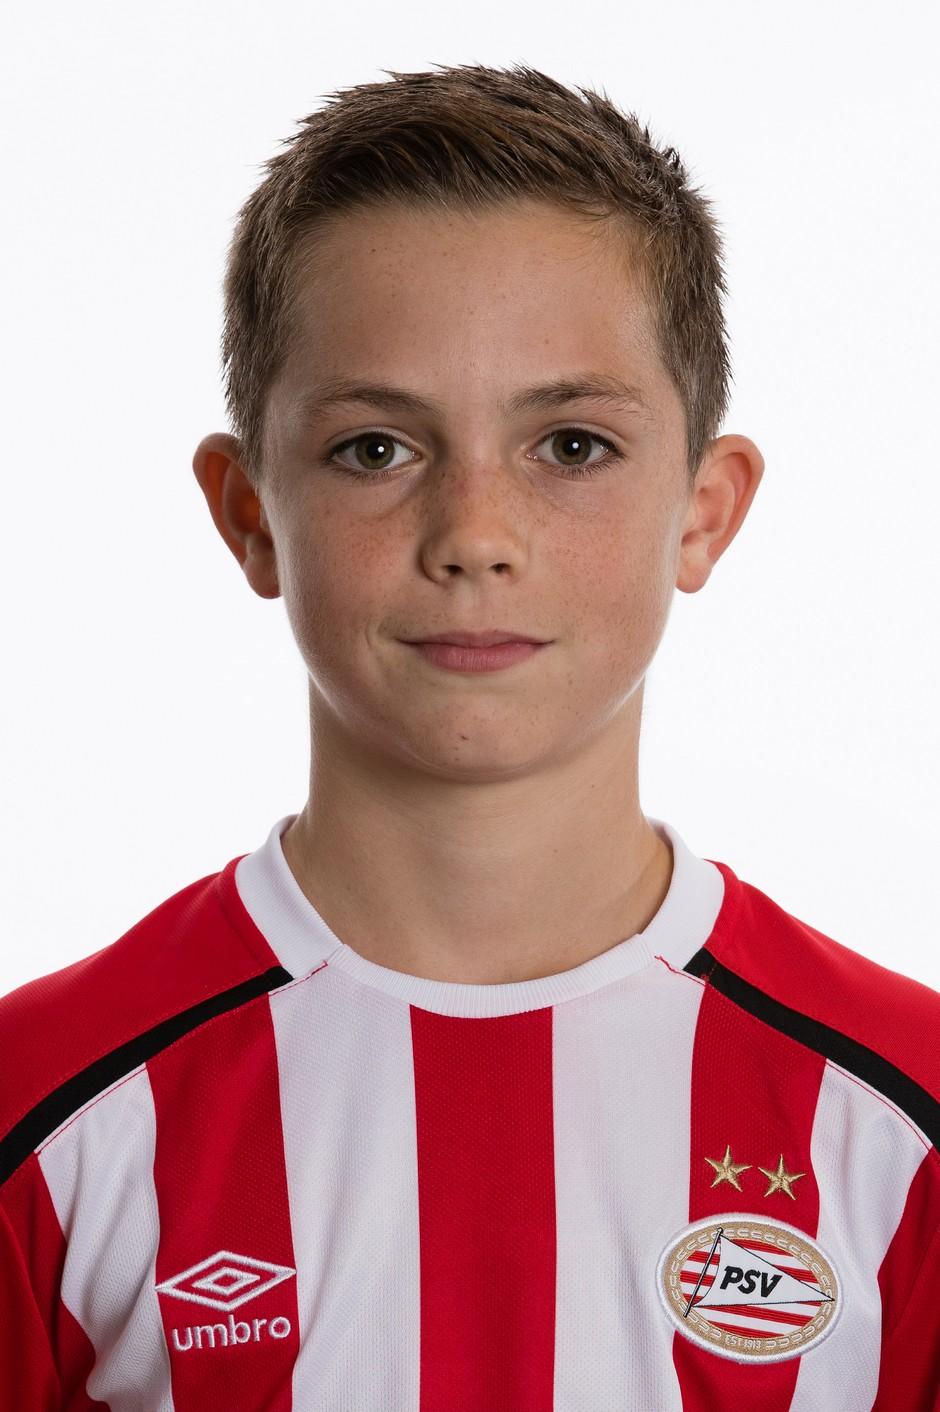 PSV O12 - 2016-2017